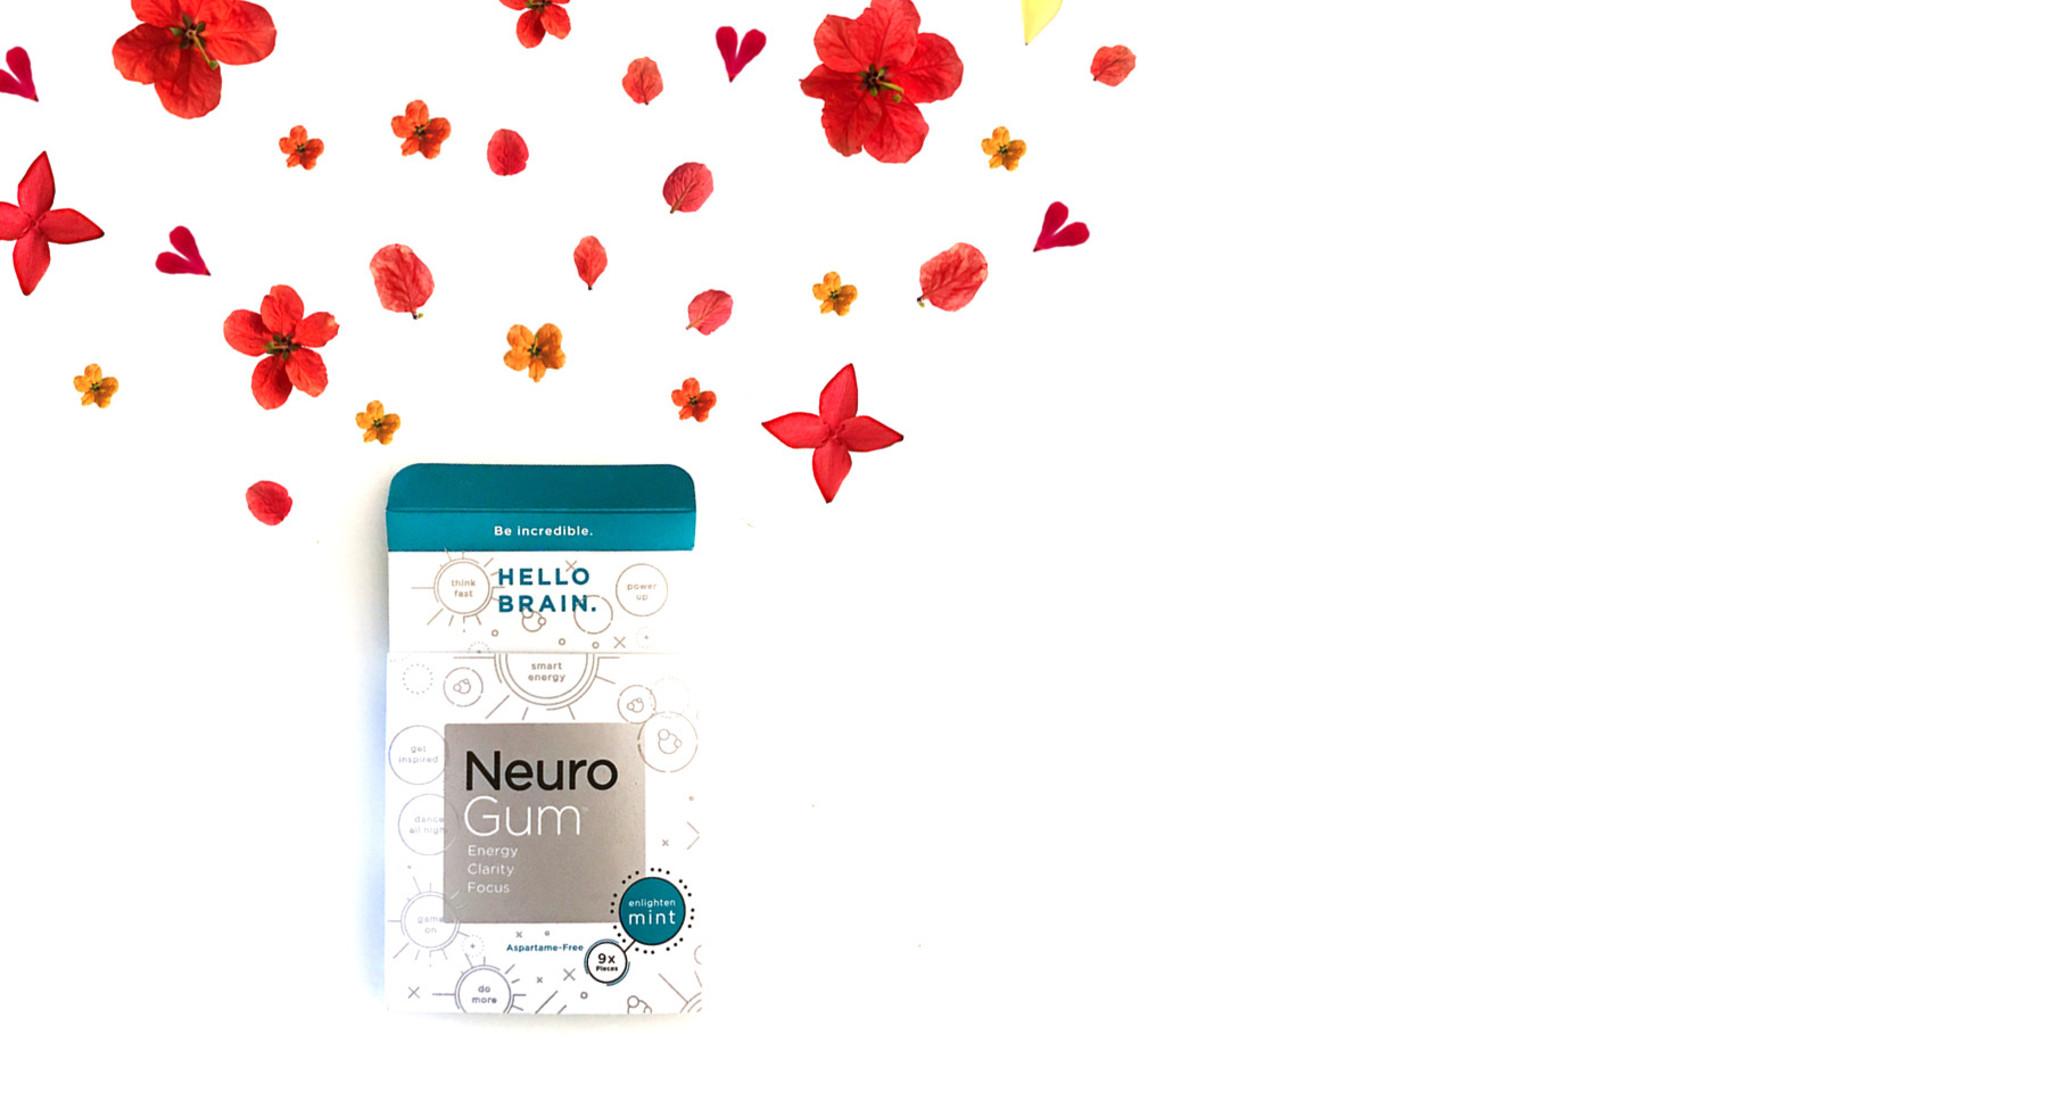 NeuroGum Energy Gum